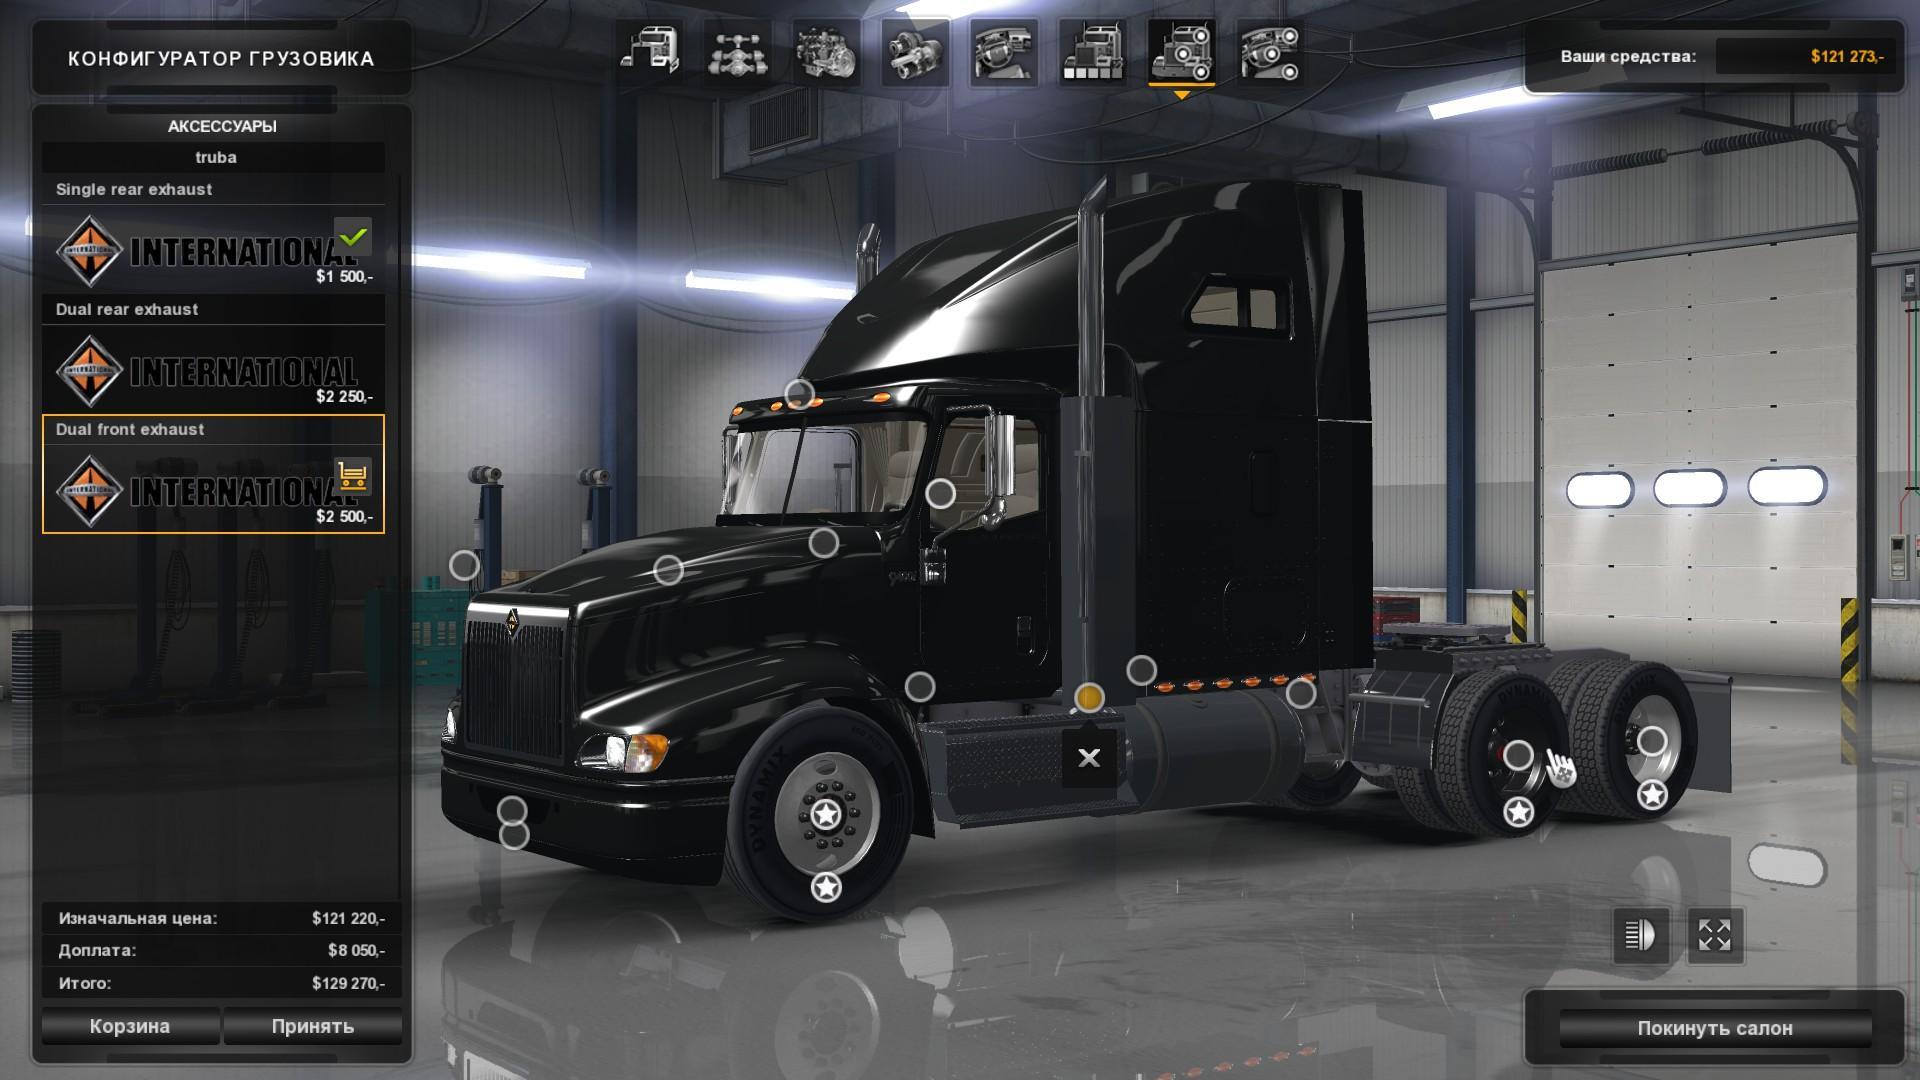 INTERNATIONAL 9400I V1.0.0.4 Mod -Euro Truck Simulator 2 Mods